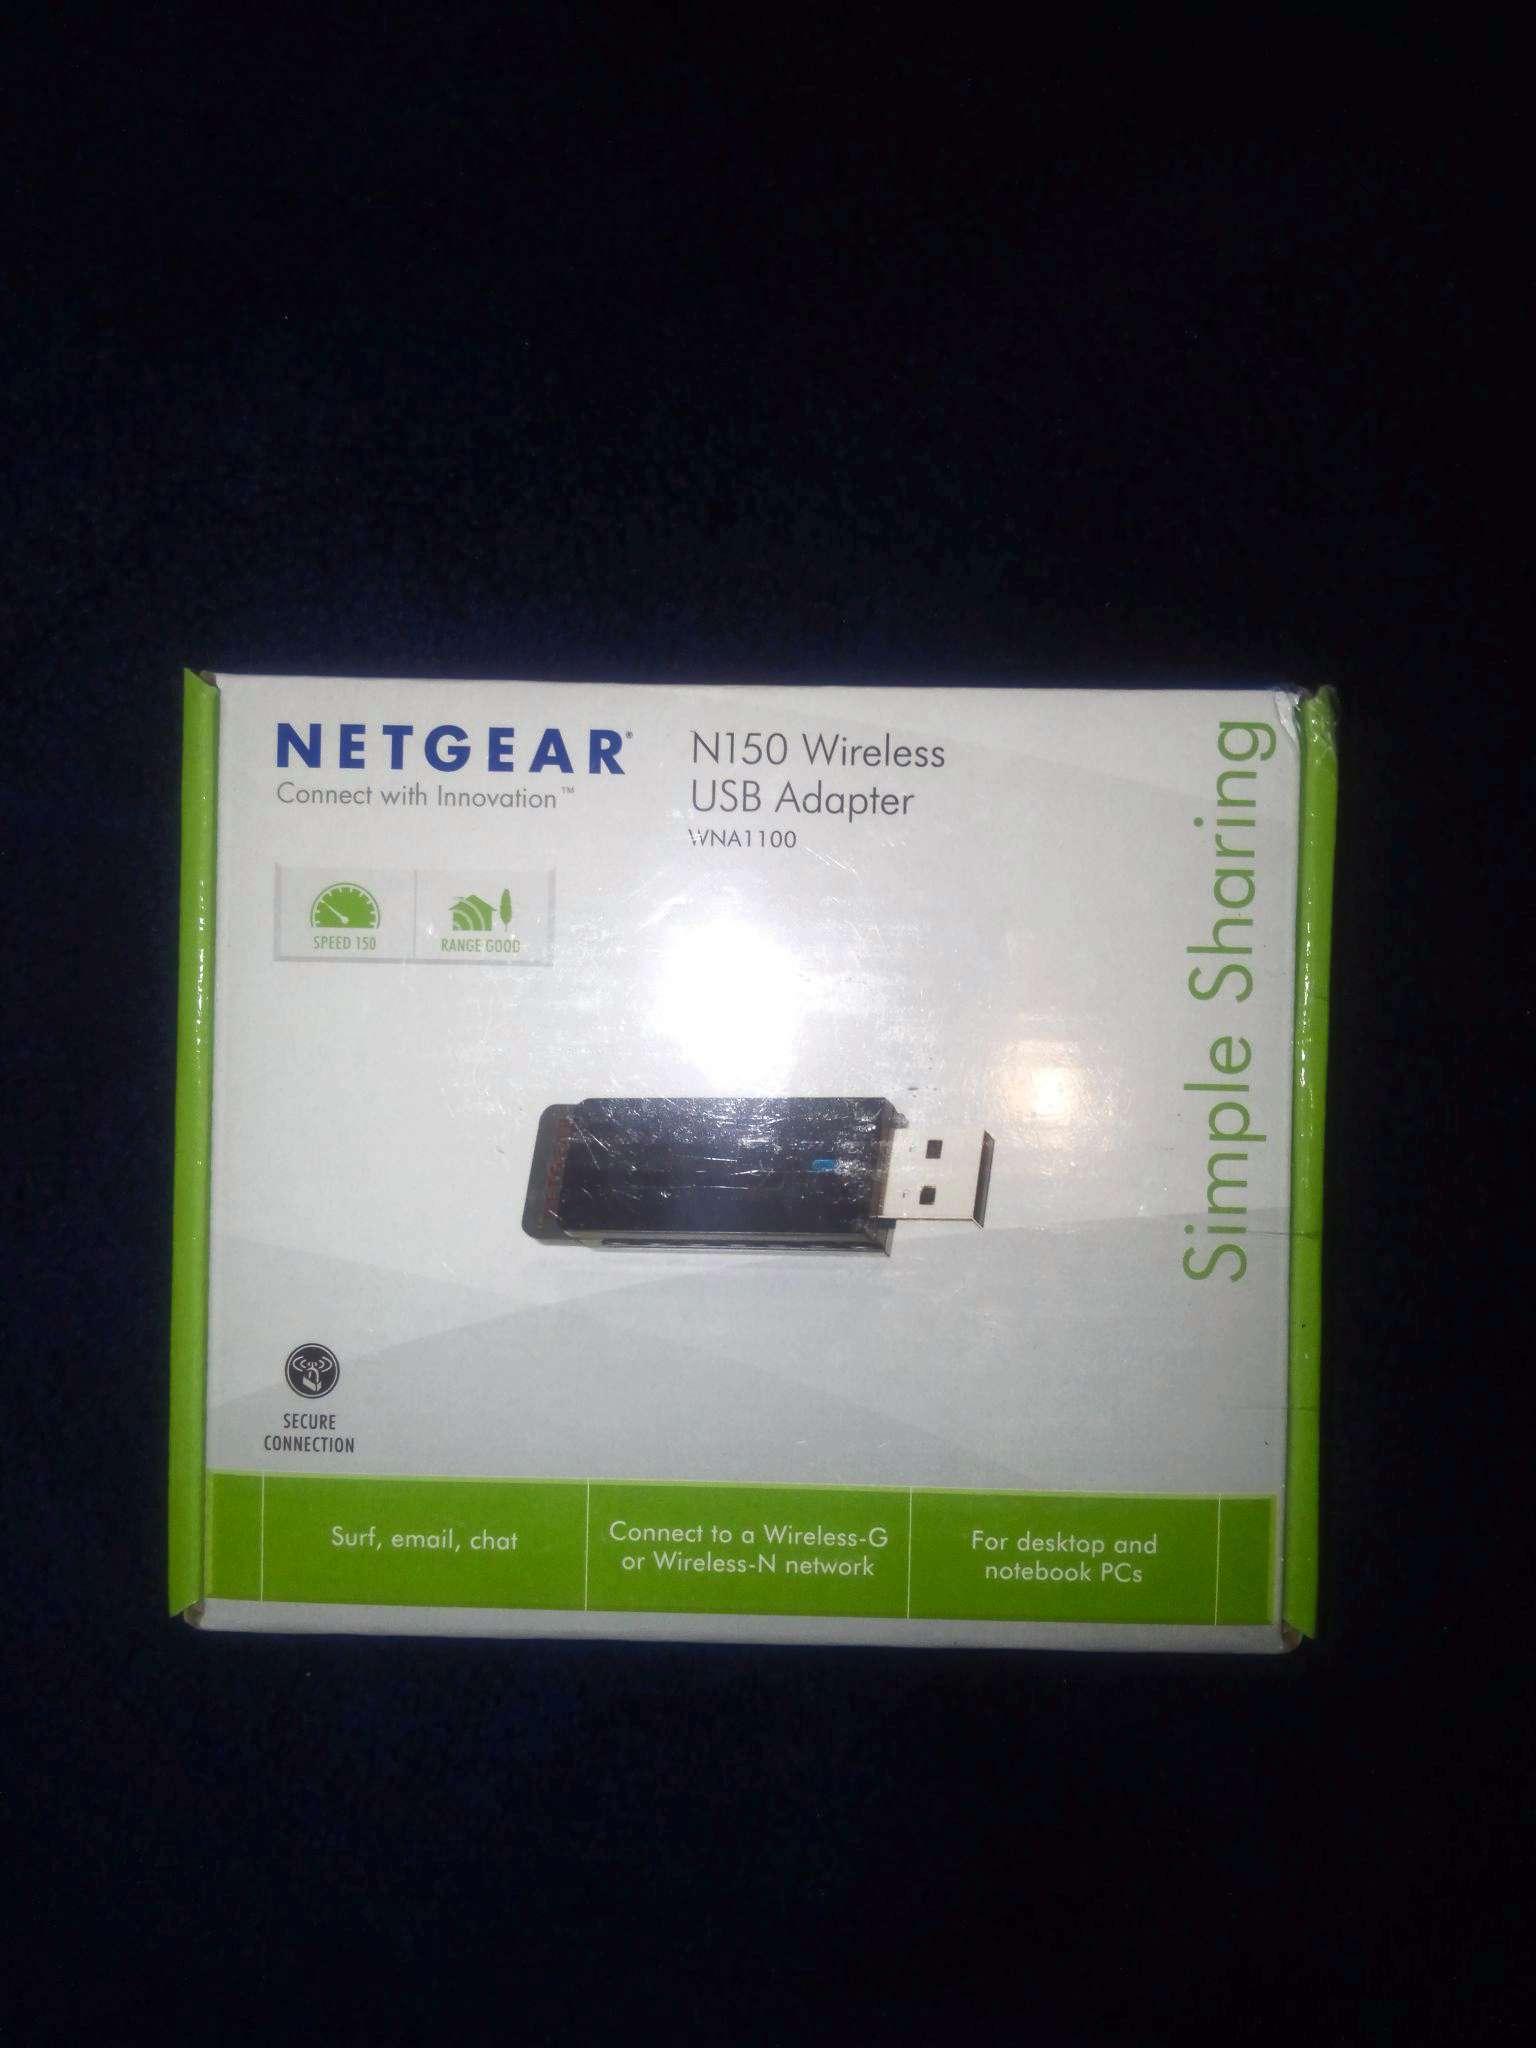 Becoming Phill) Netgear n150 wireless usb adapter wna1100